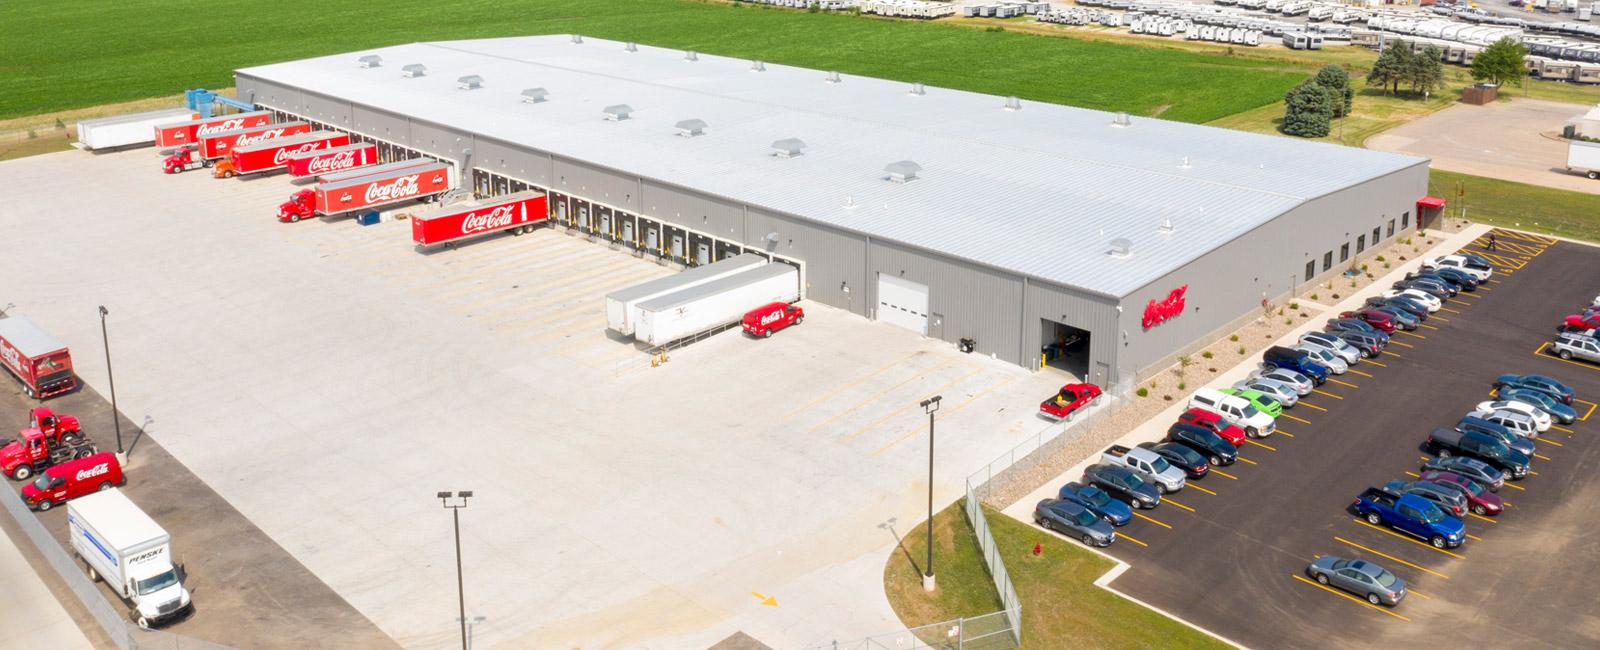 Atlantic Coca-Cola Bottling Company Warehouse